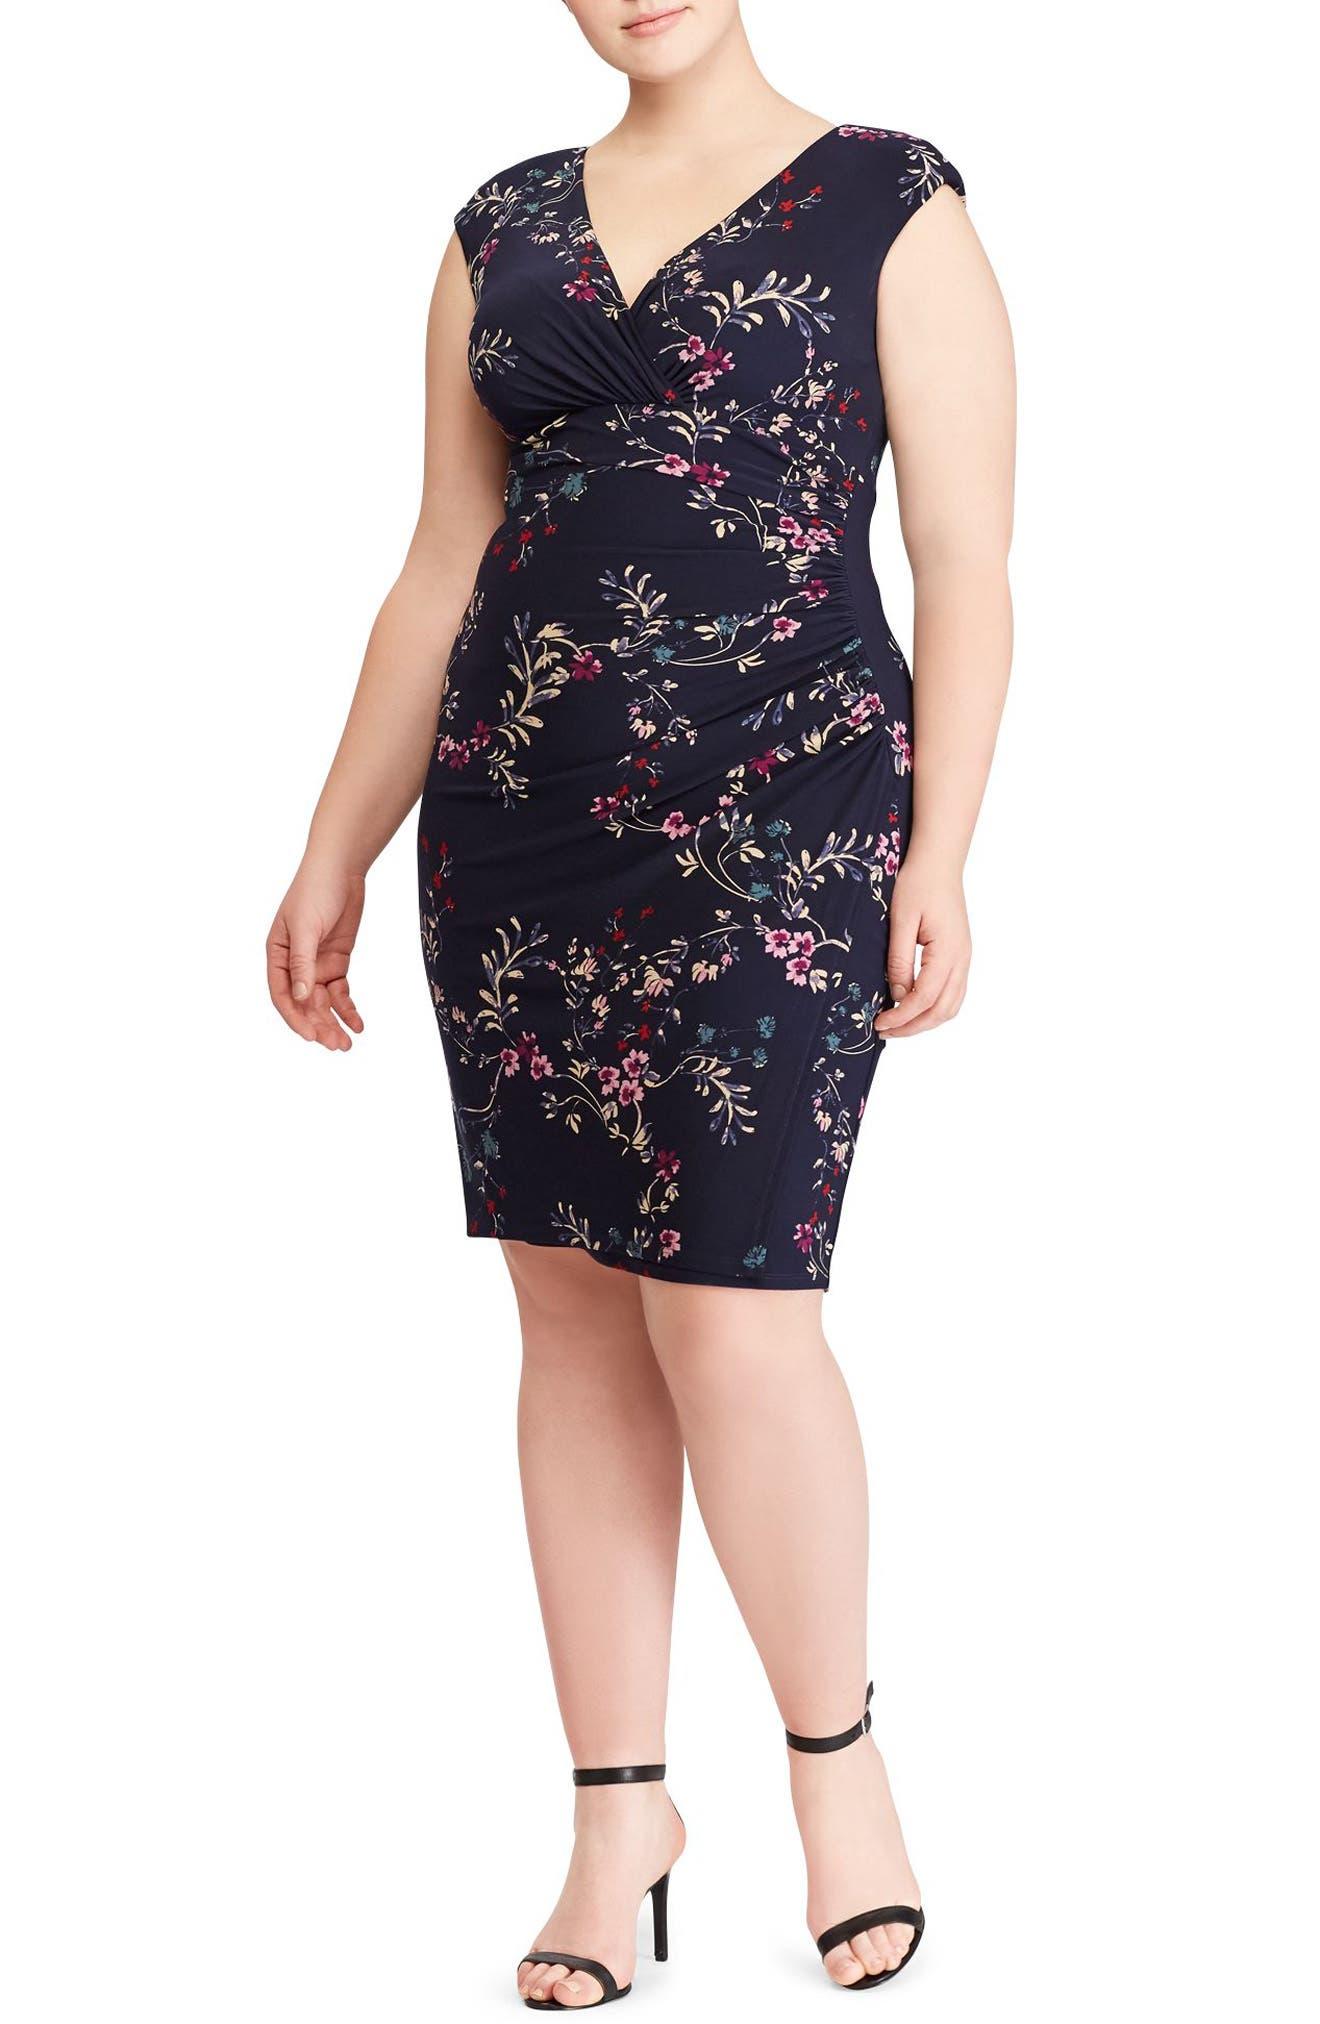 Adara Floral Jersey Dress,                             Main thumbnail 1, color,                             410